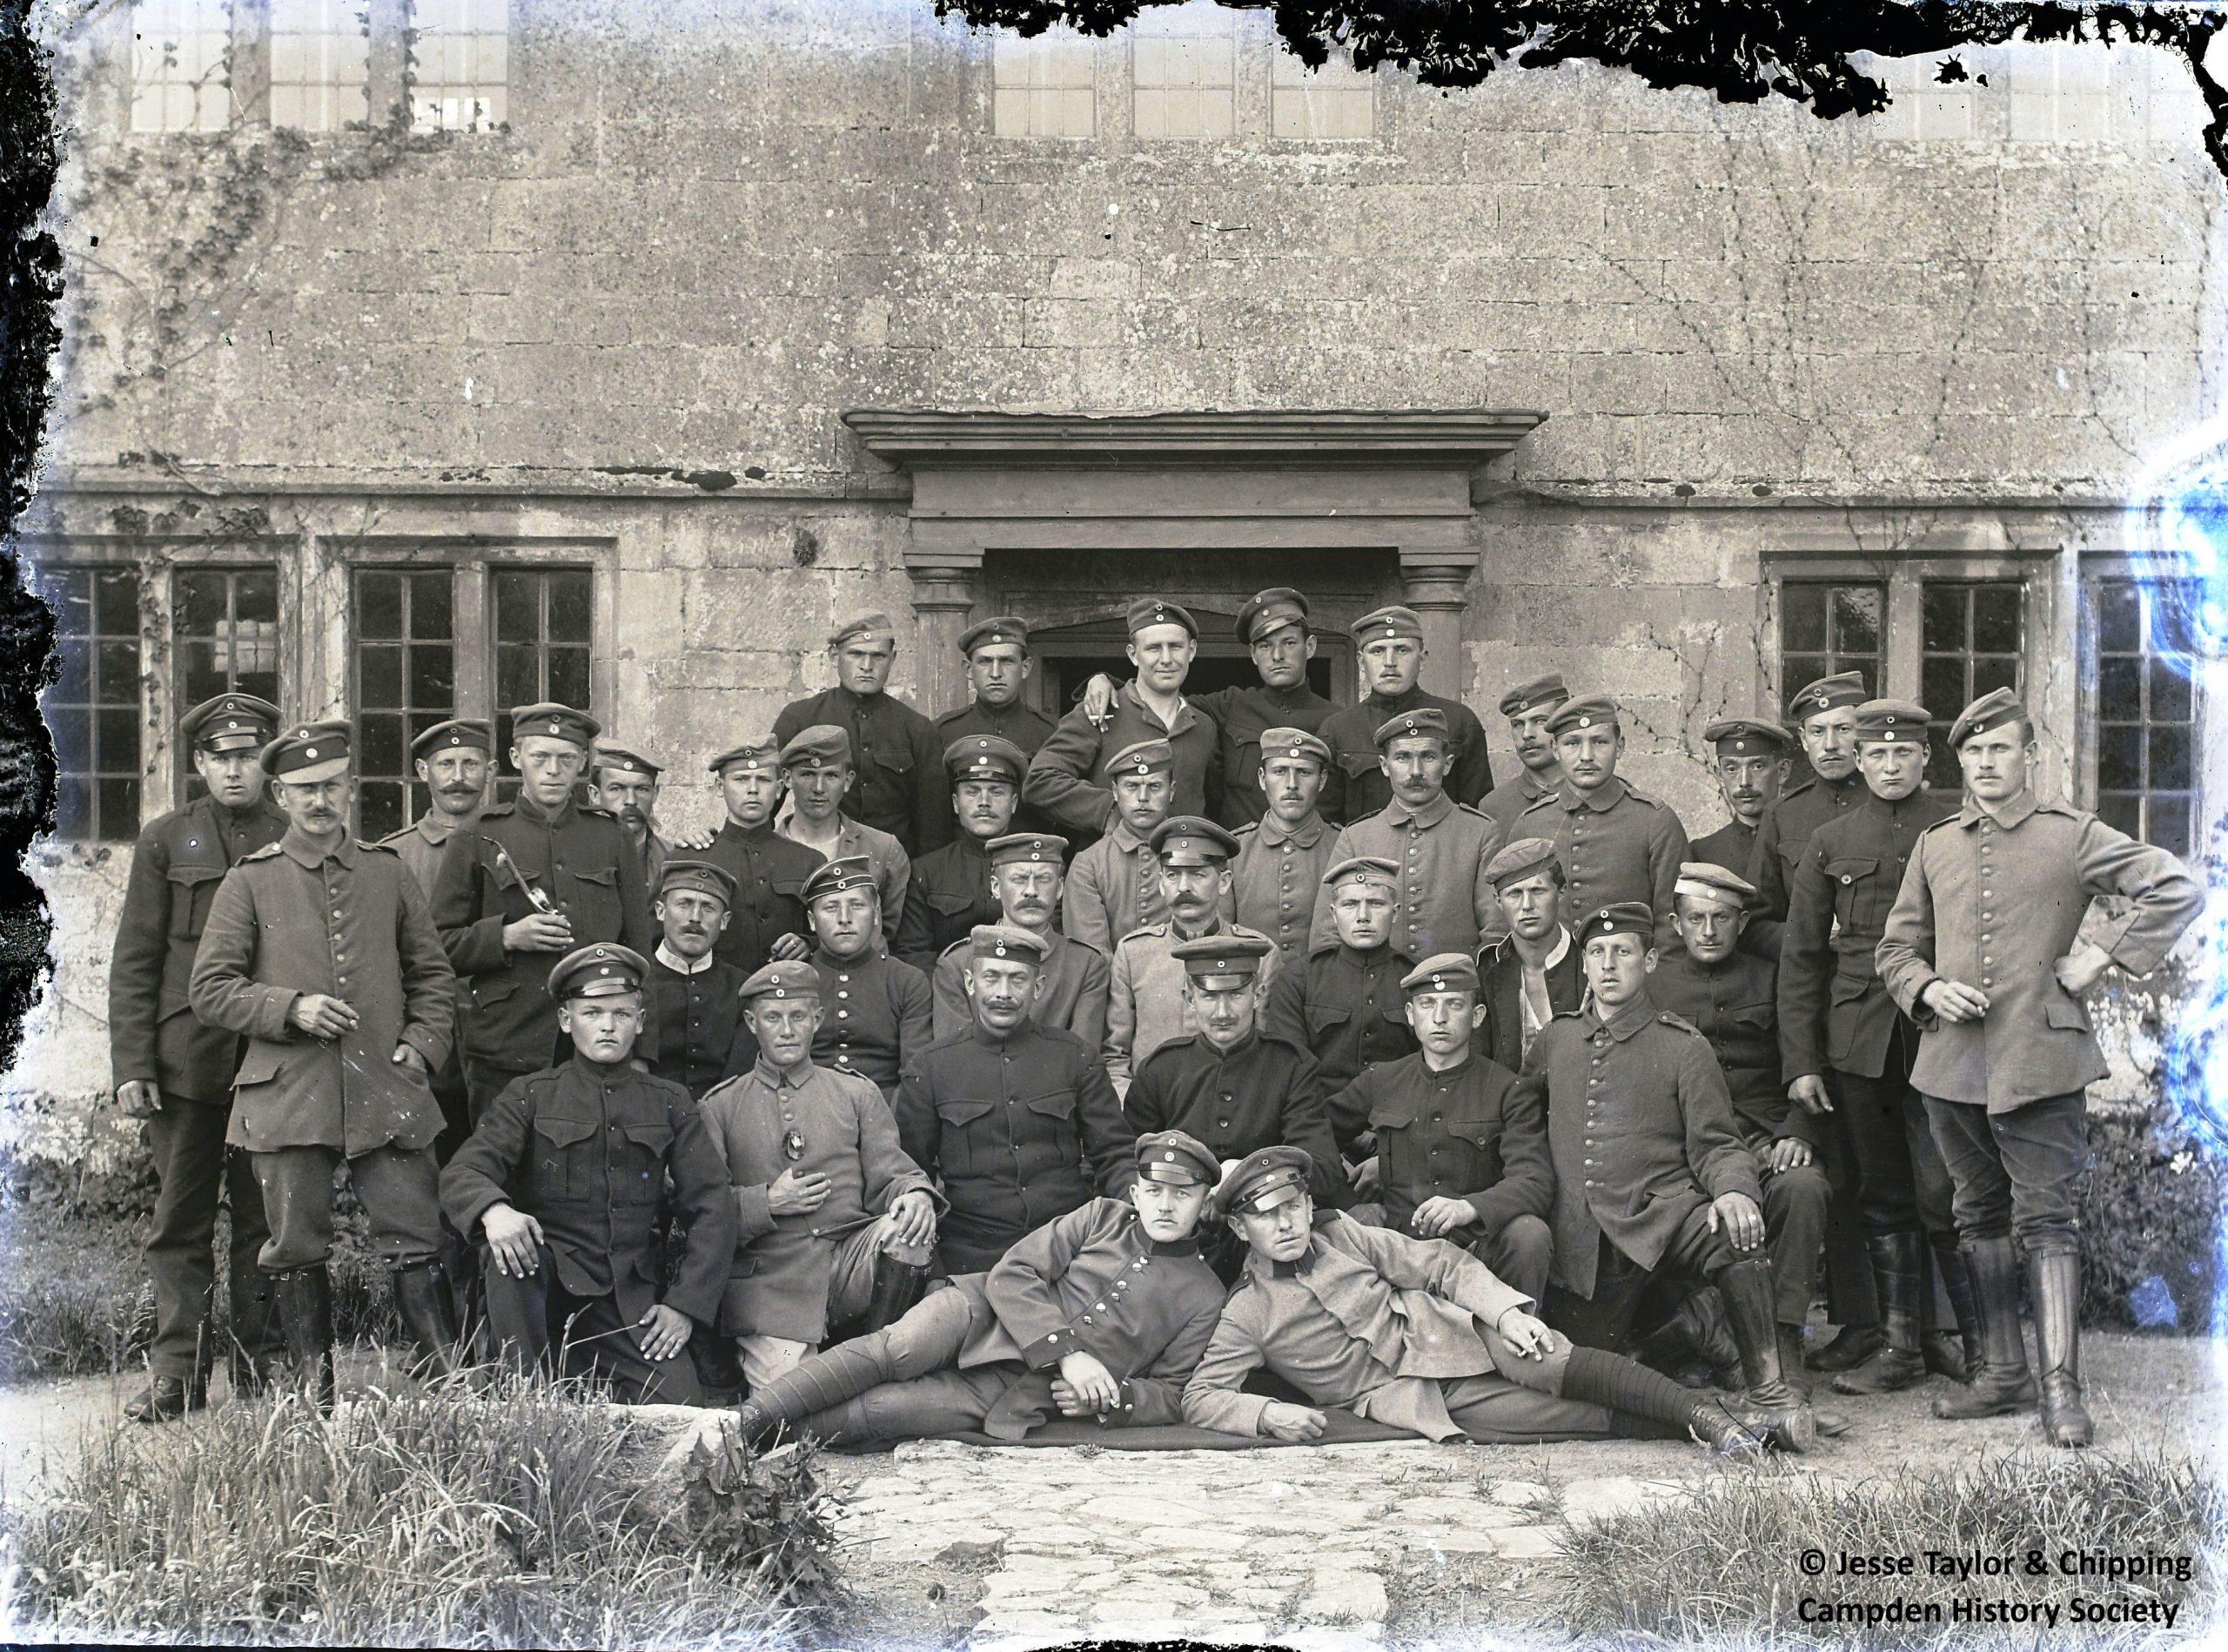 Group photo of German POWs in uniform